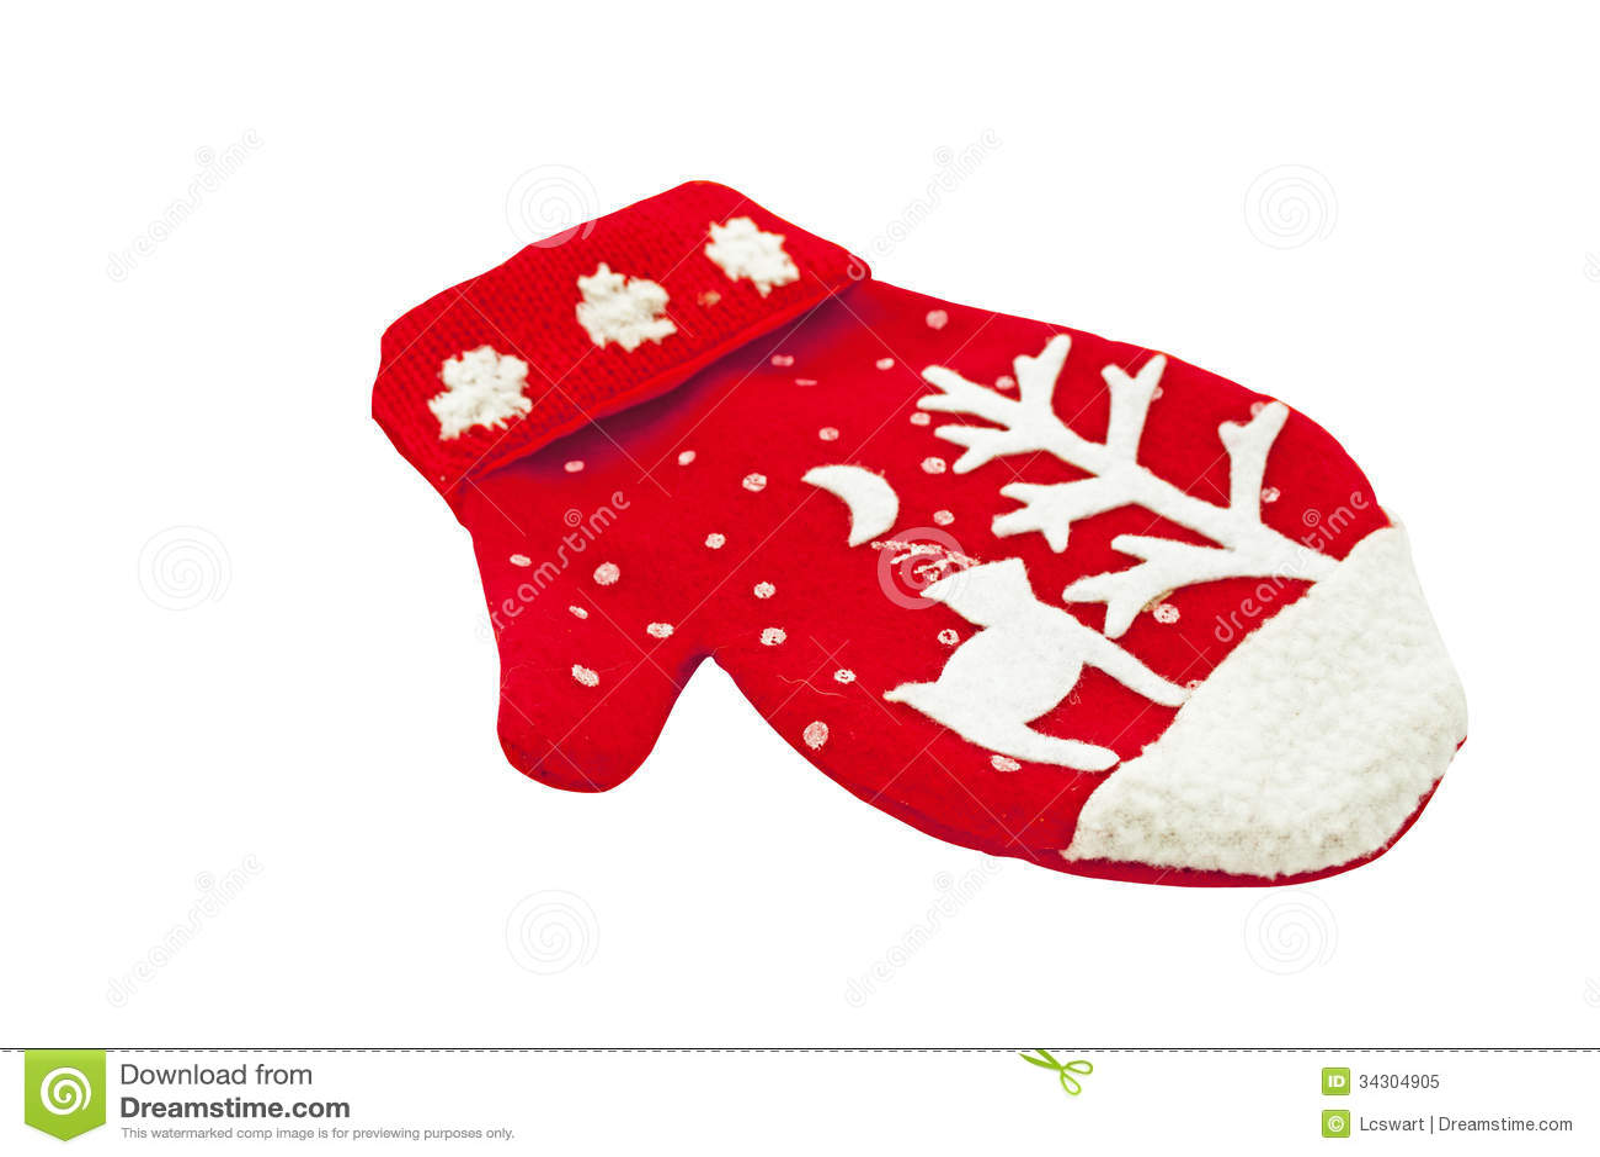 Mitten christmas decorations - Knitted Woolen Mitten With Christmas Decoration